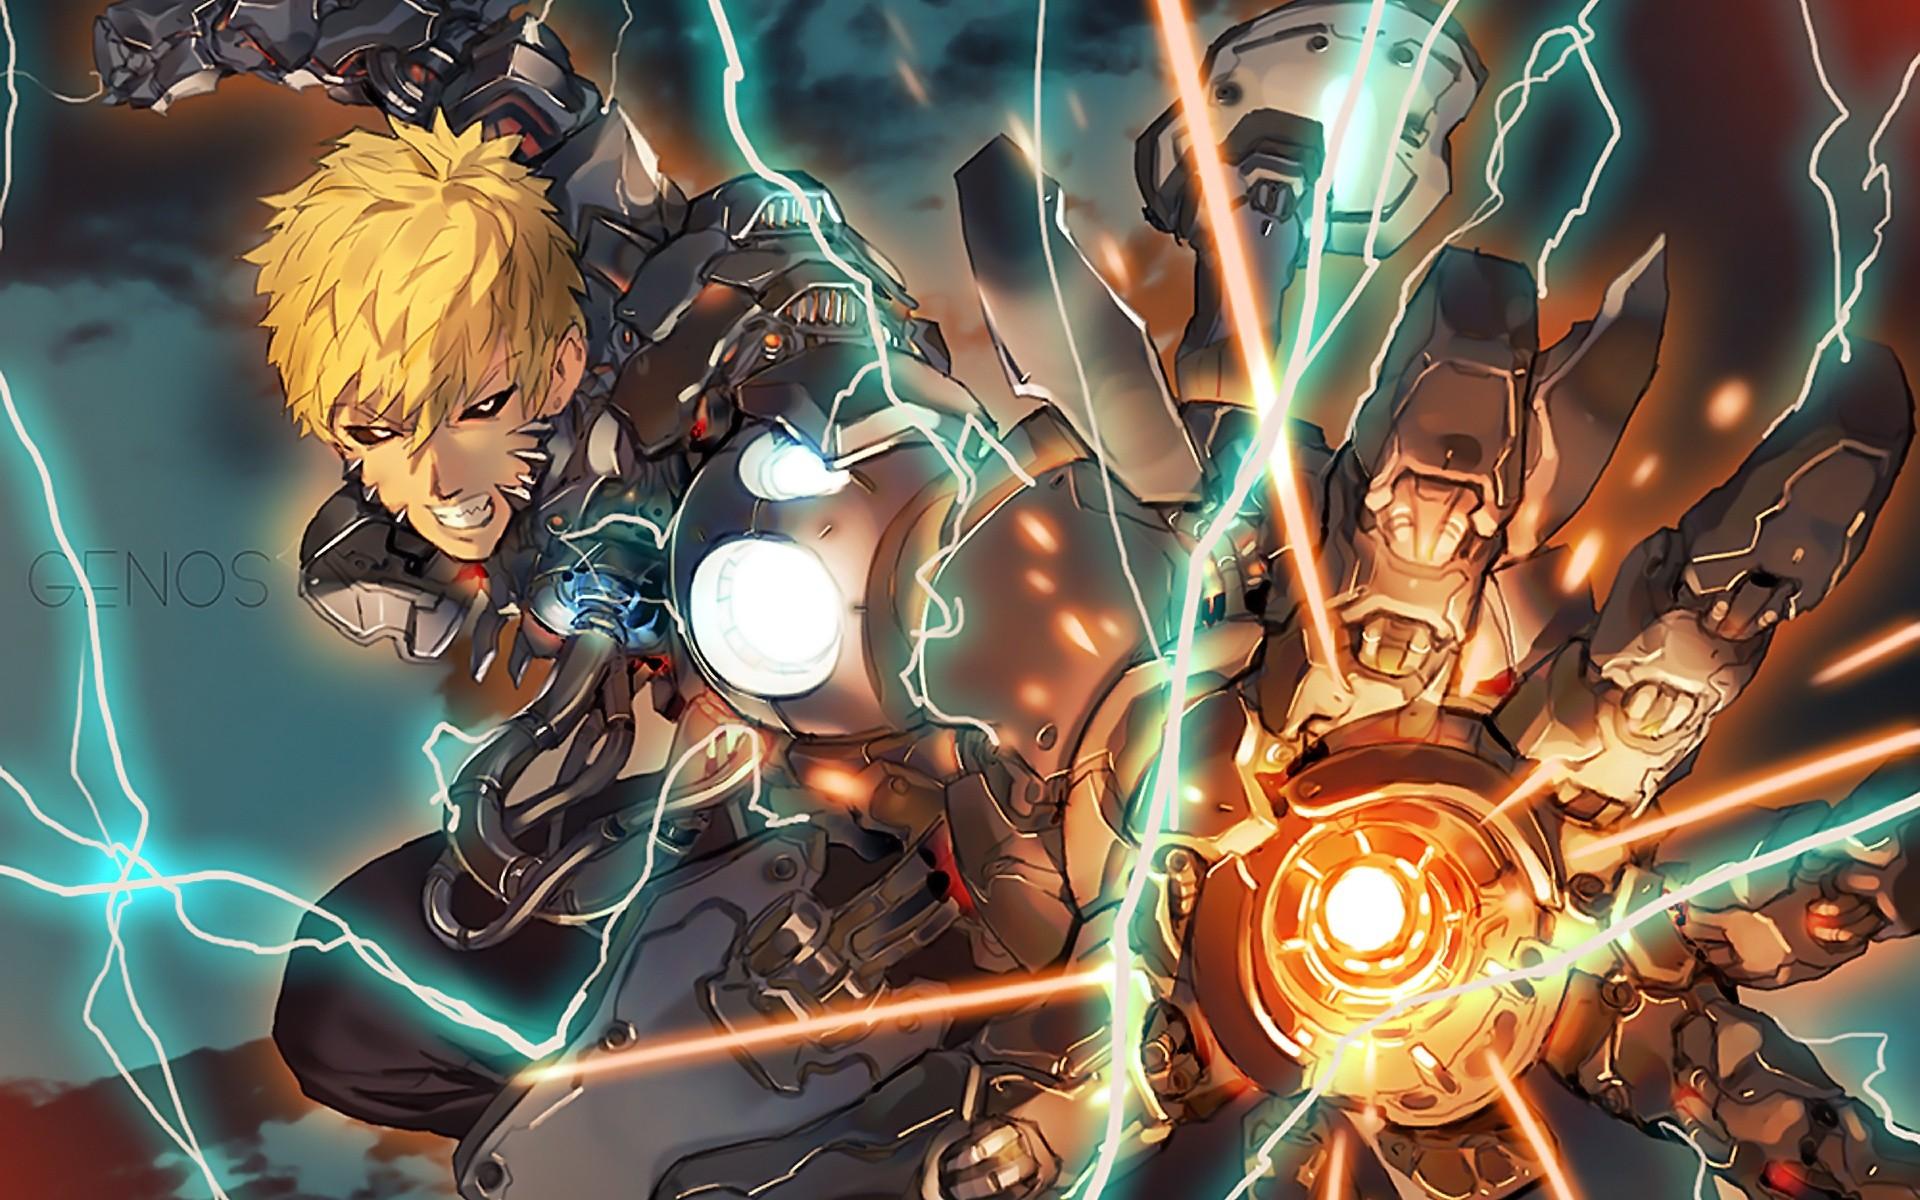 Wallpaper : anime, lightning, cyborg, machine, One Punch Man, comics, mythology, Genos, games ...